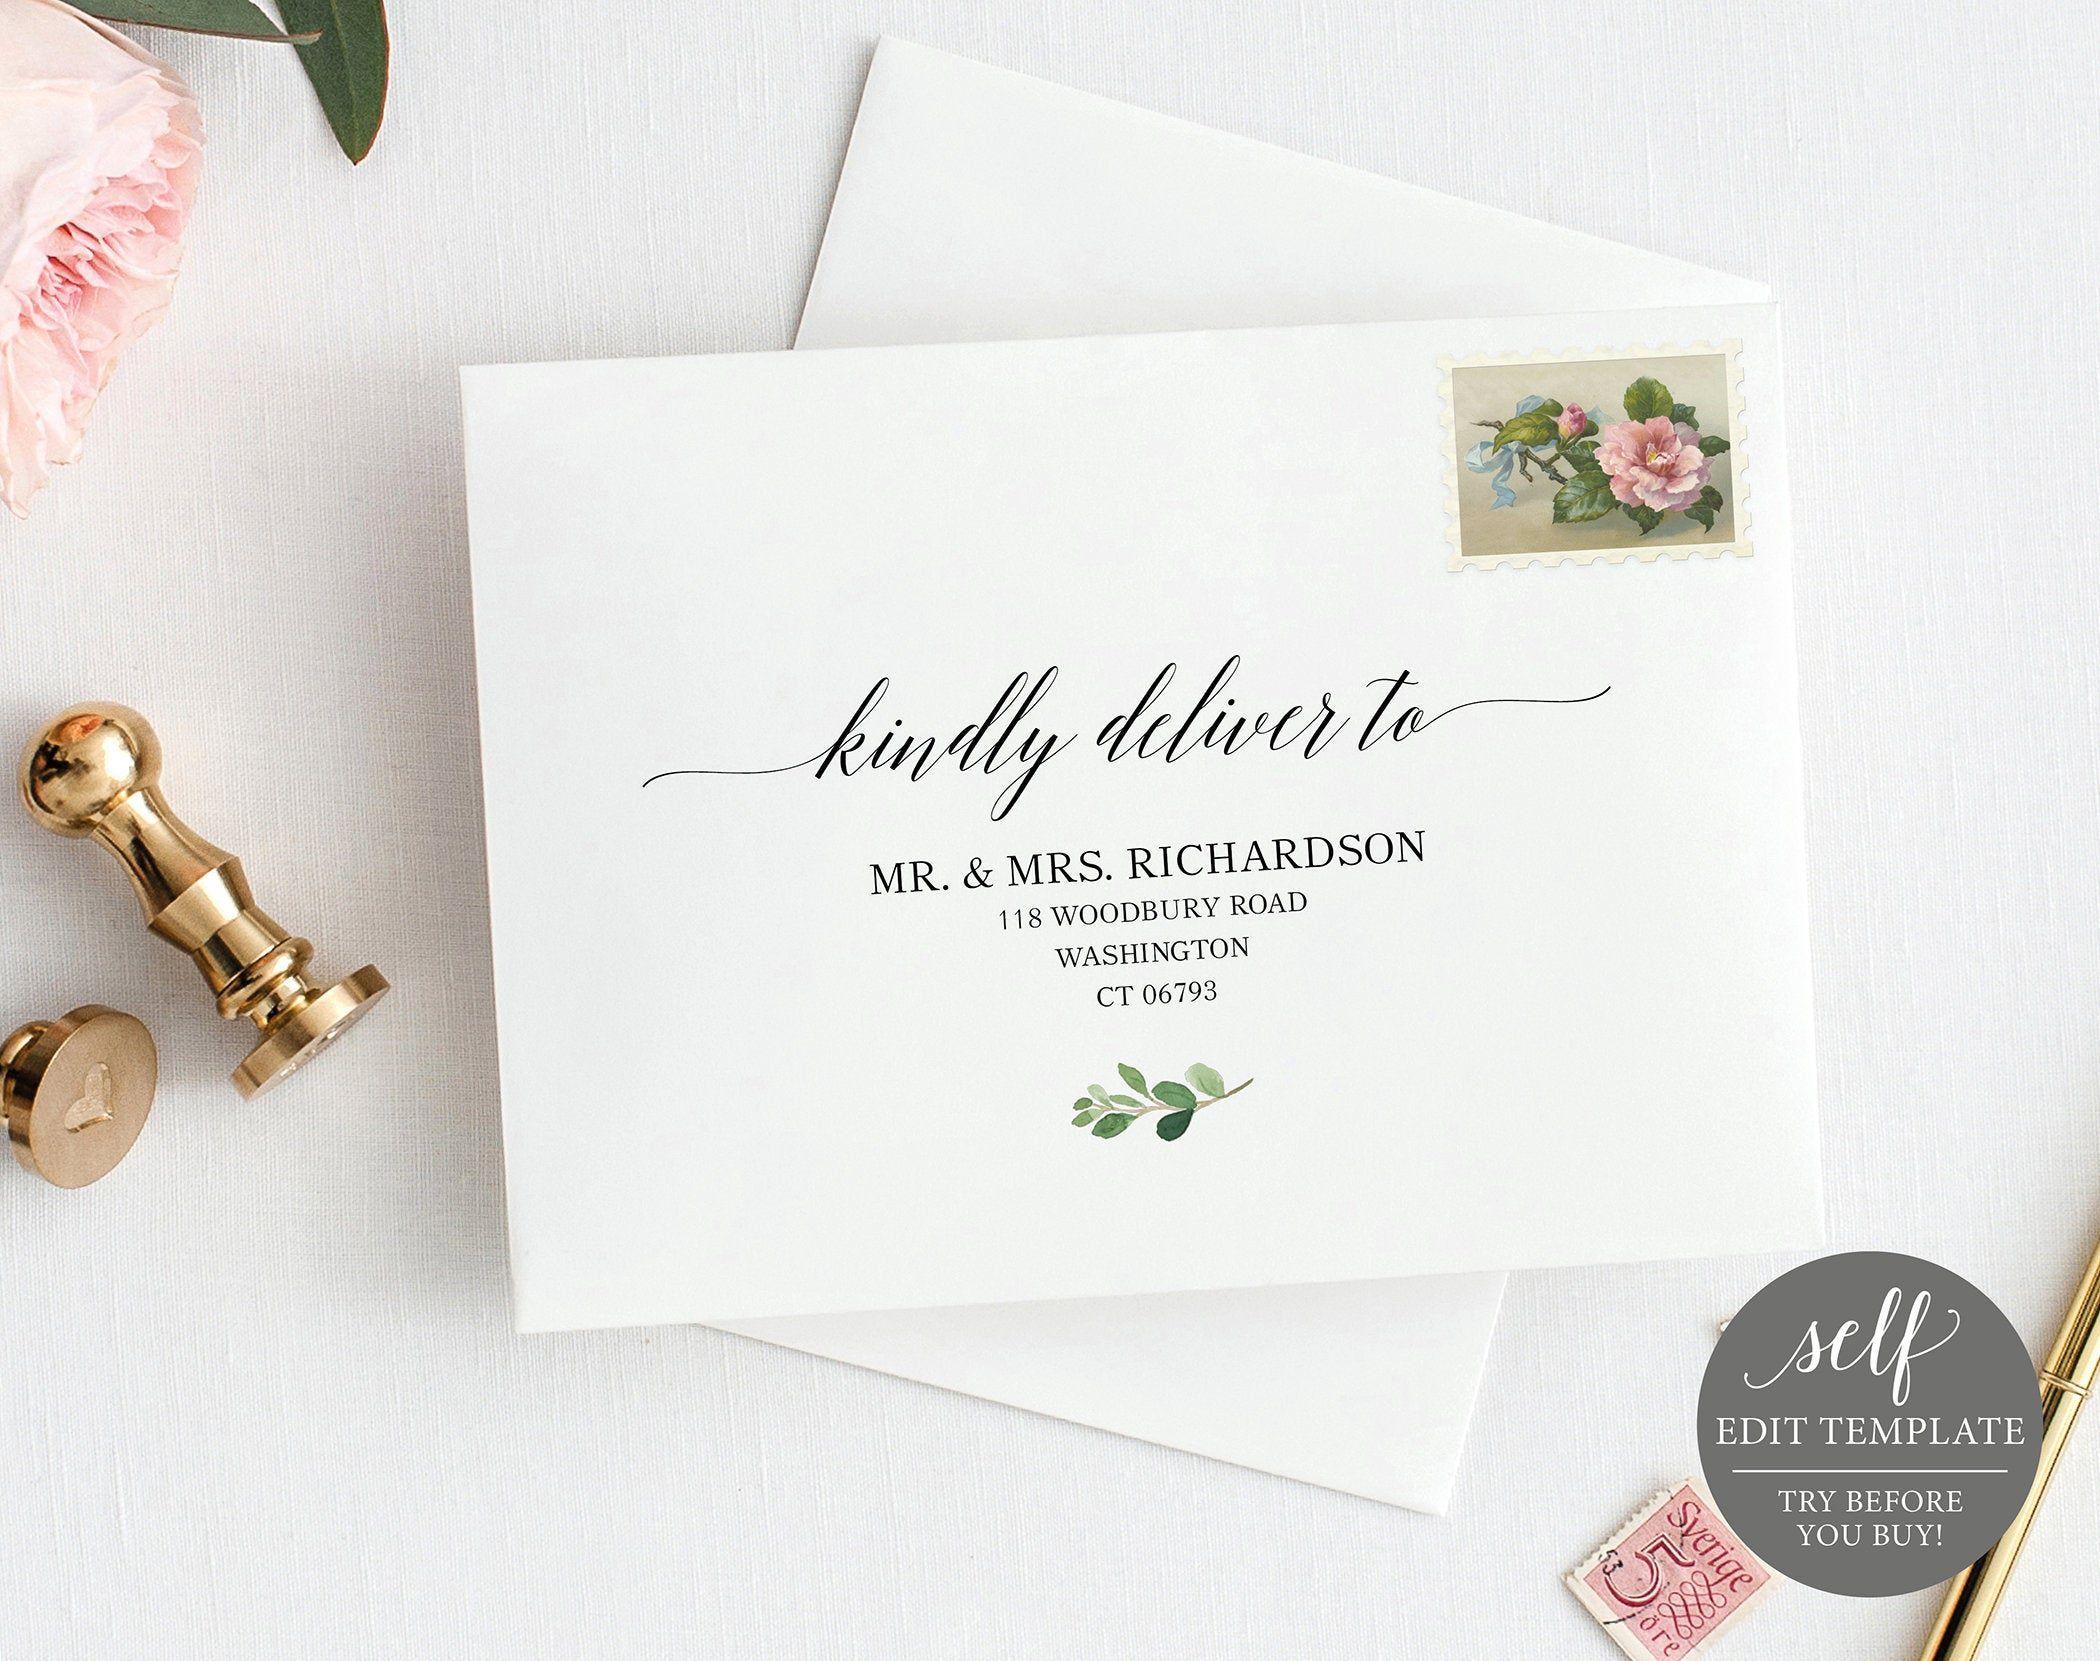 005 Dreaded Wedding Addres Label Template Concept  Free PrintableFull